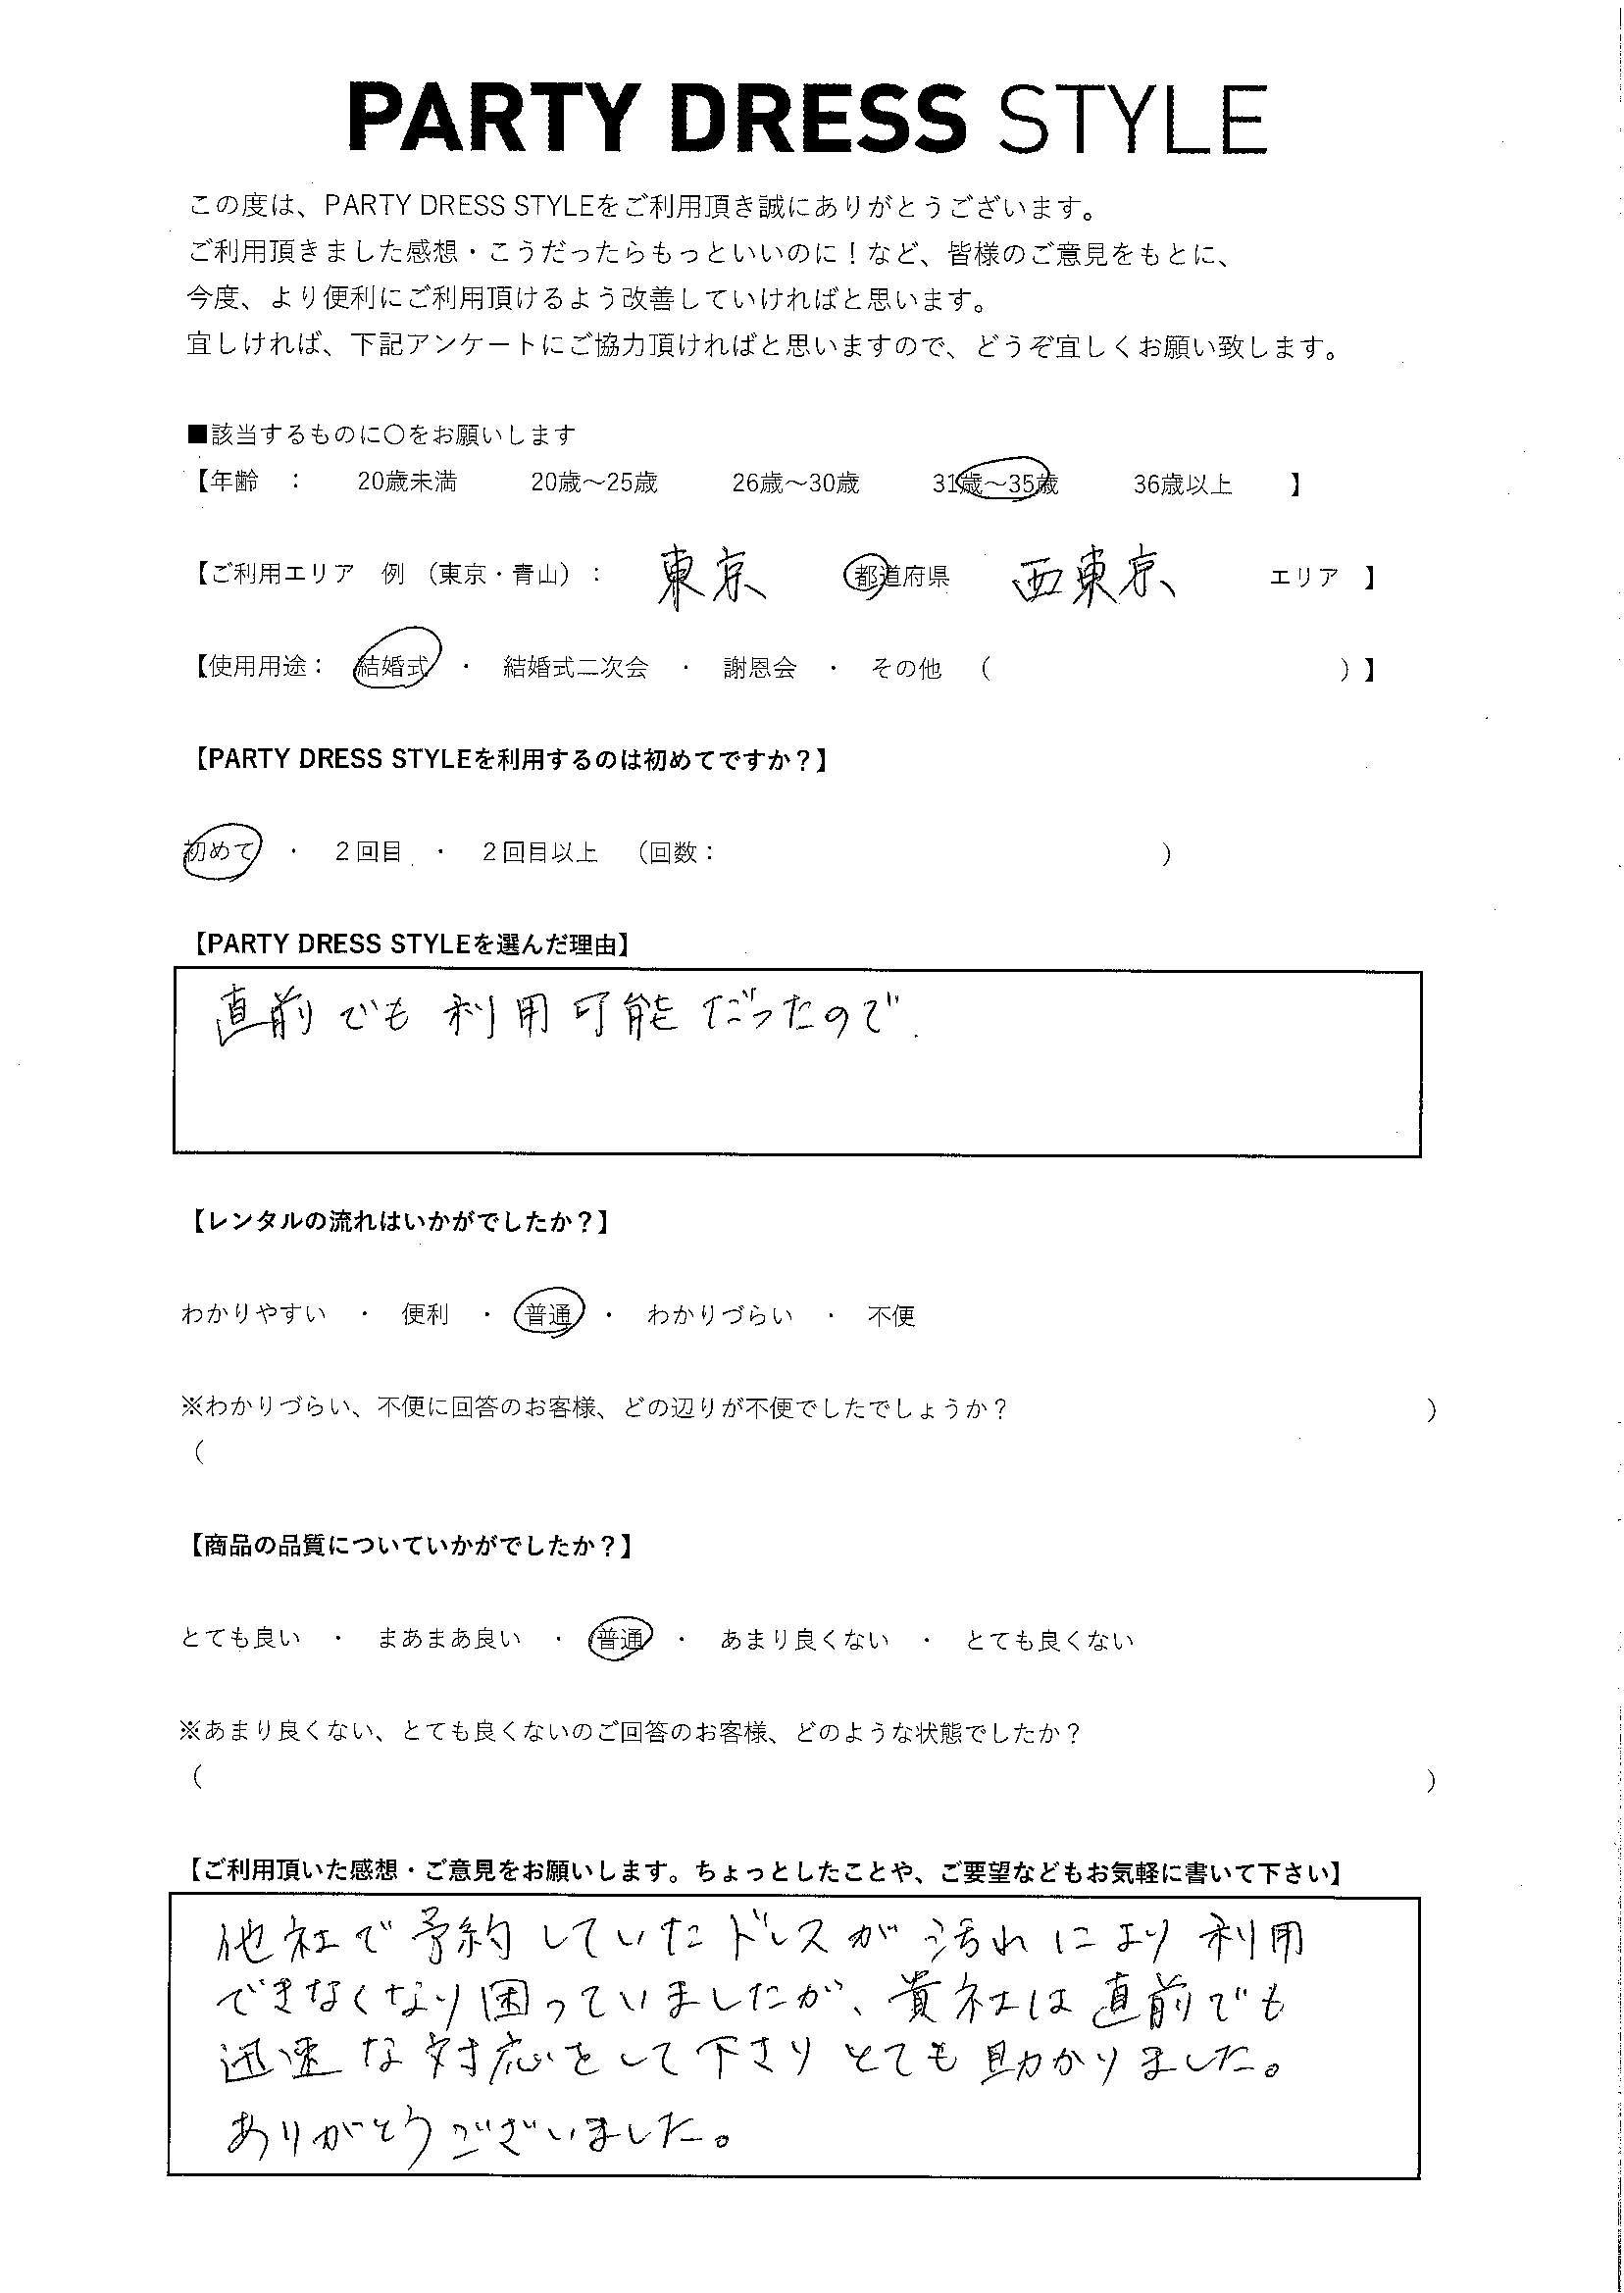 6/2結婚式利用 東京都・西東京エリア